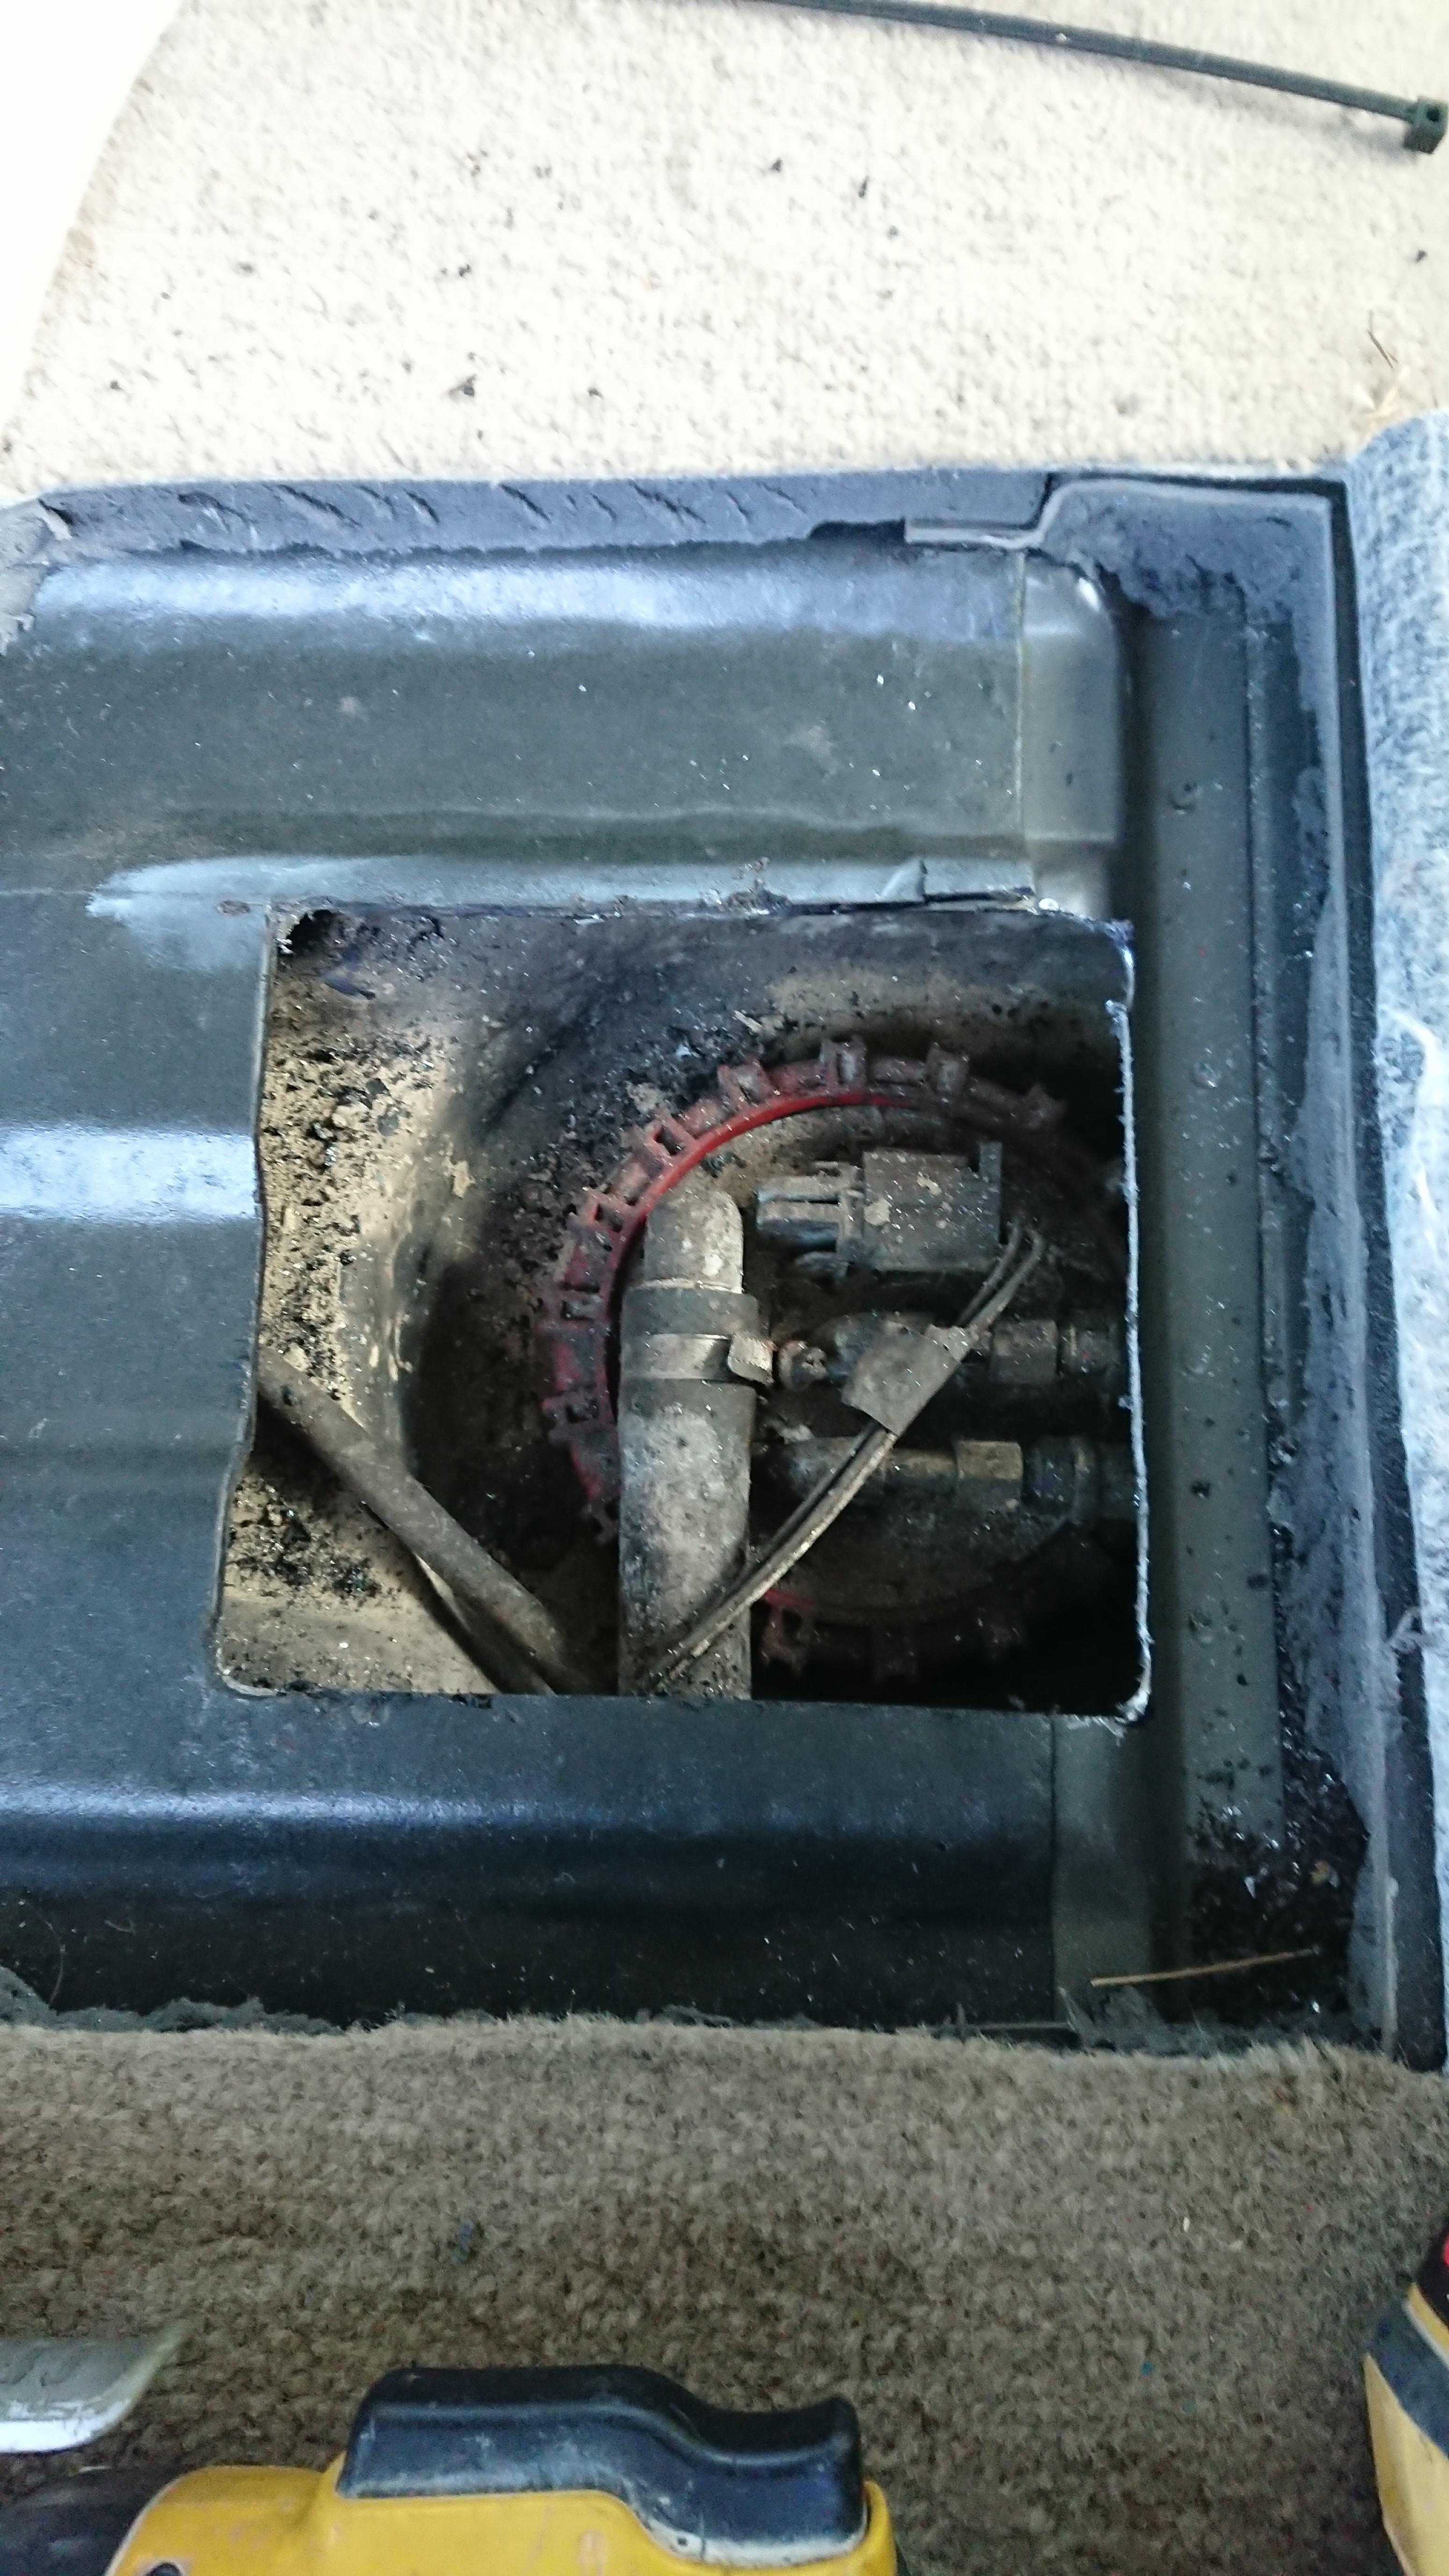 2001 P38 Fuel Pump / Location / Specs-dsc_0021.jpg